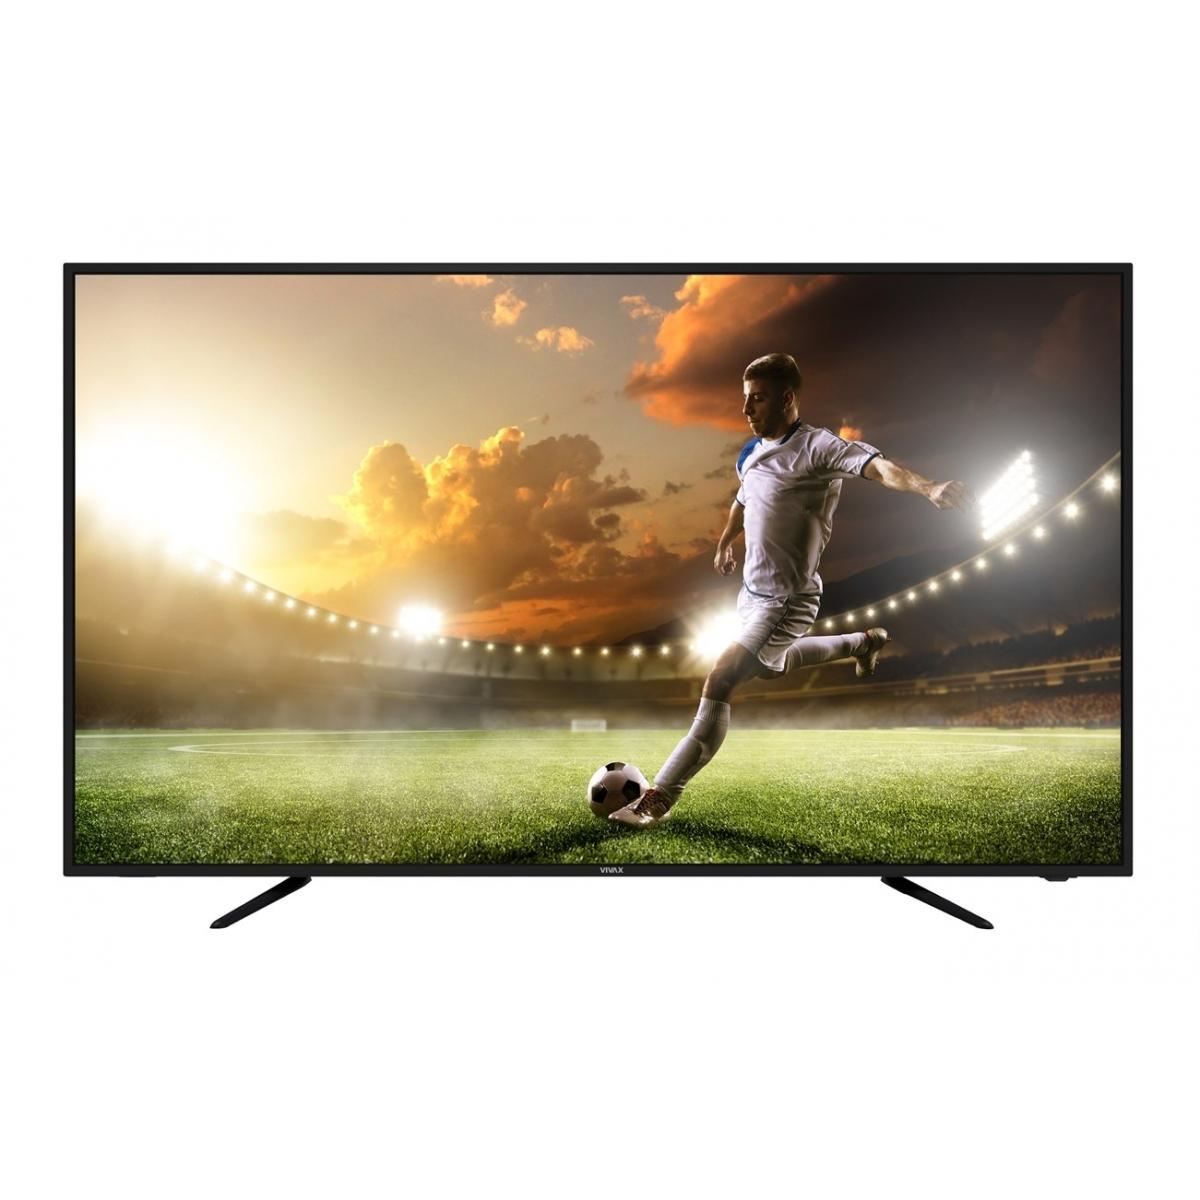 VIVAX 55UHD121T2S2 Televizor